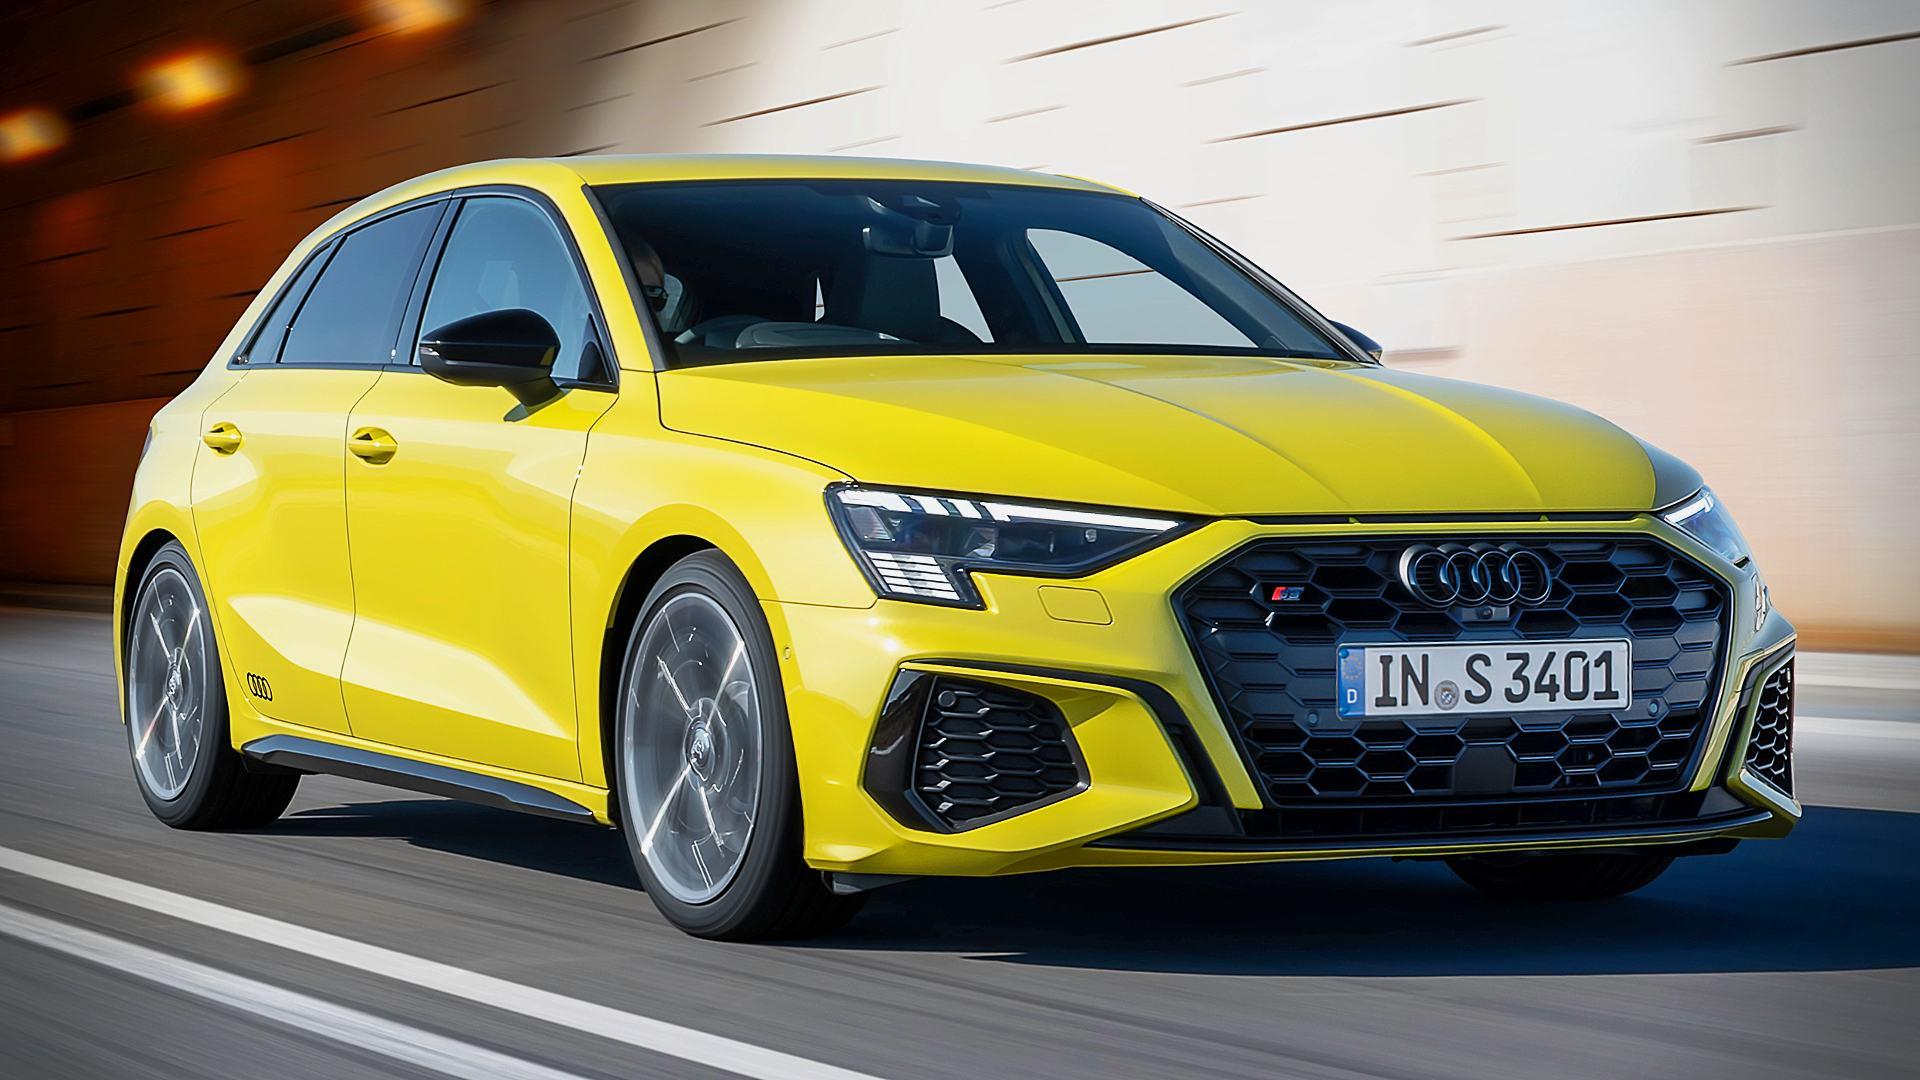 2021 Audi S3 Sportback Wallpaper